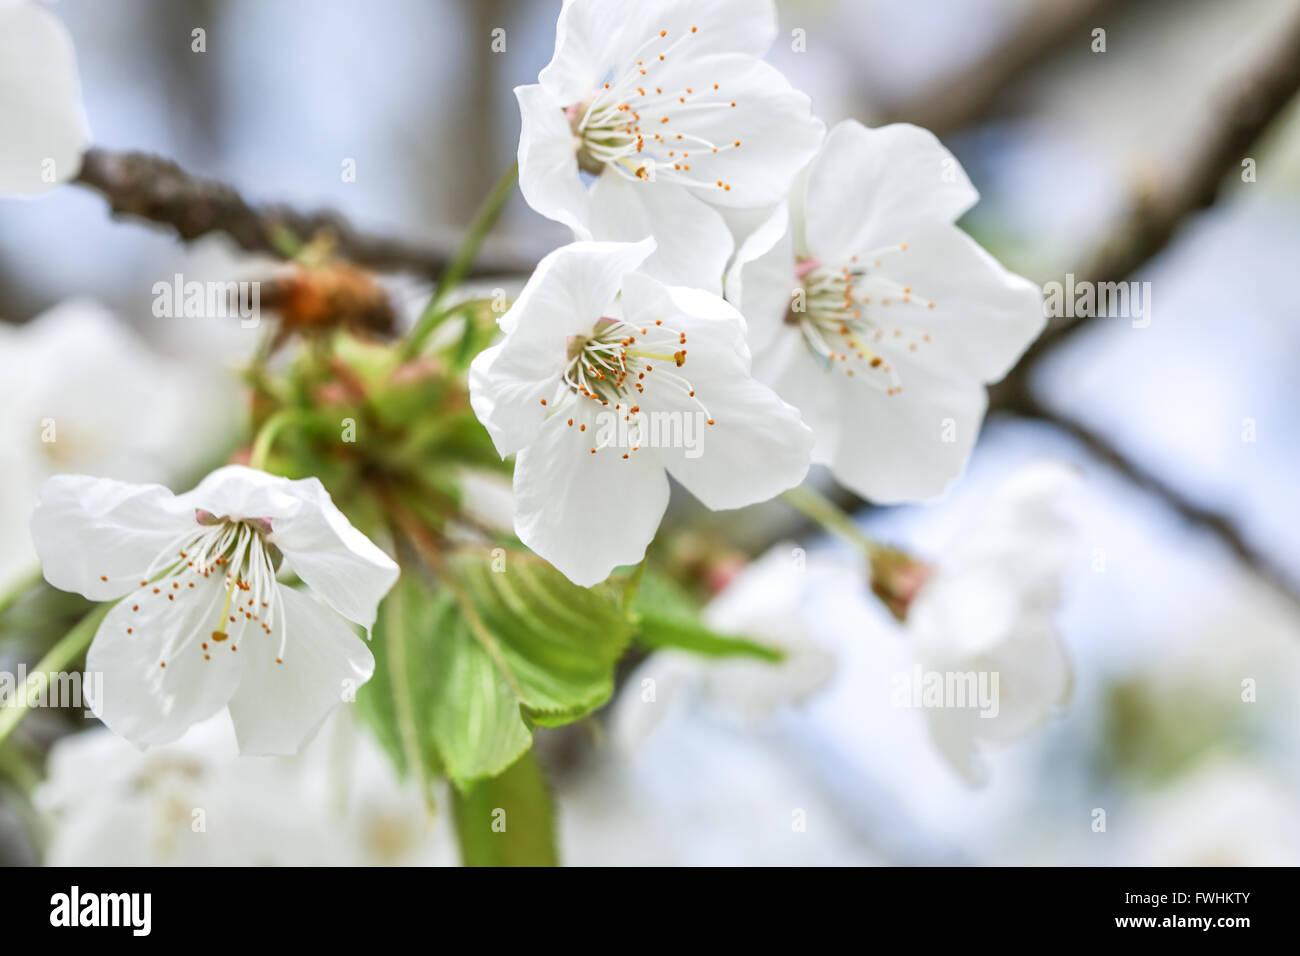 Flor de Cerezo blanco Imagen De Stock